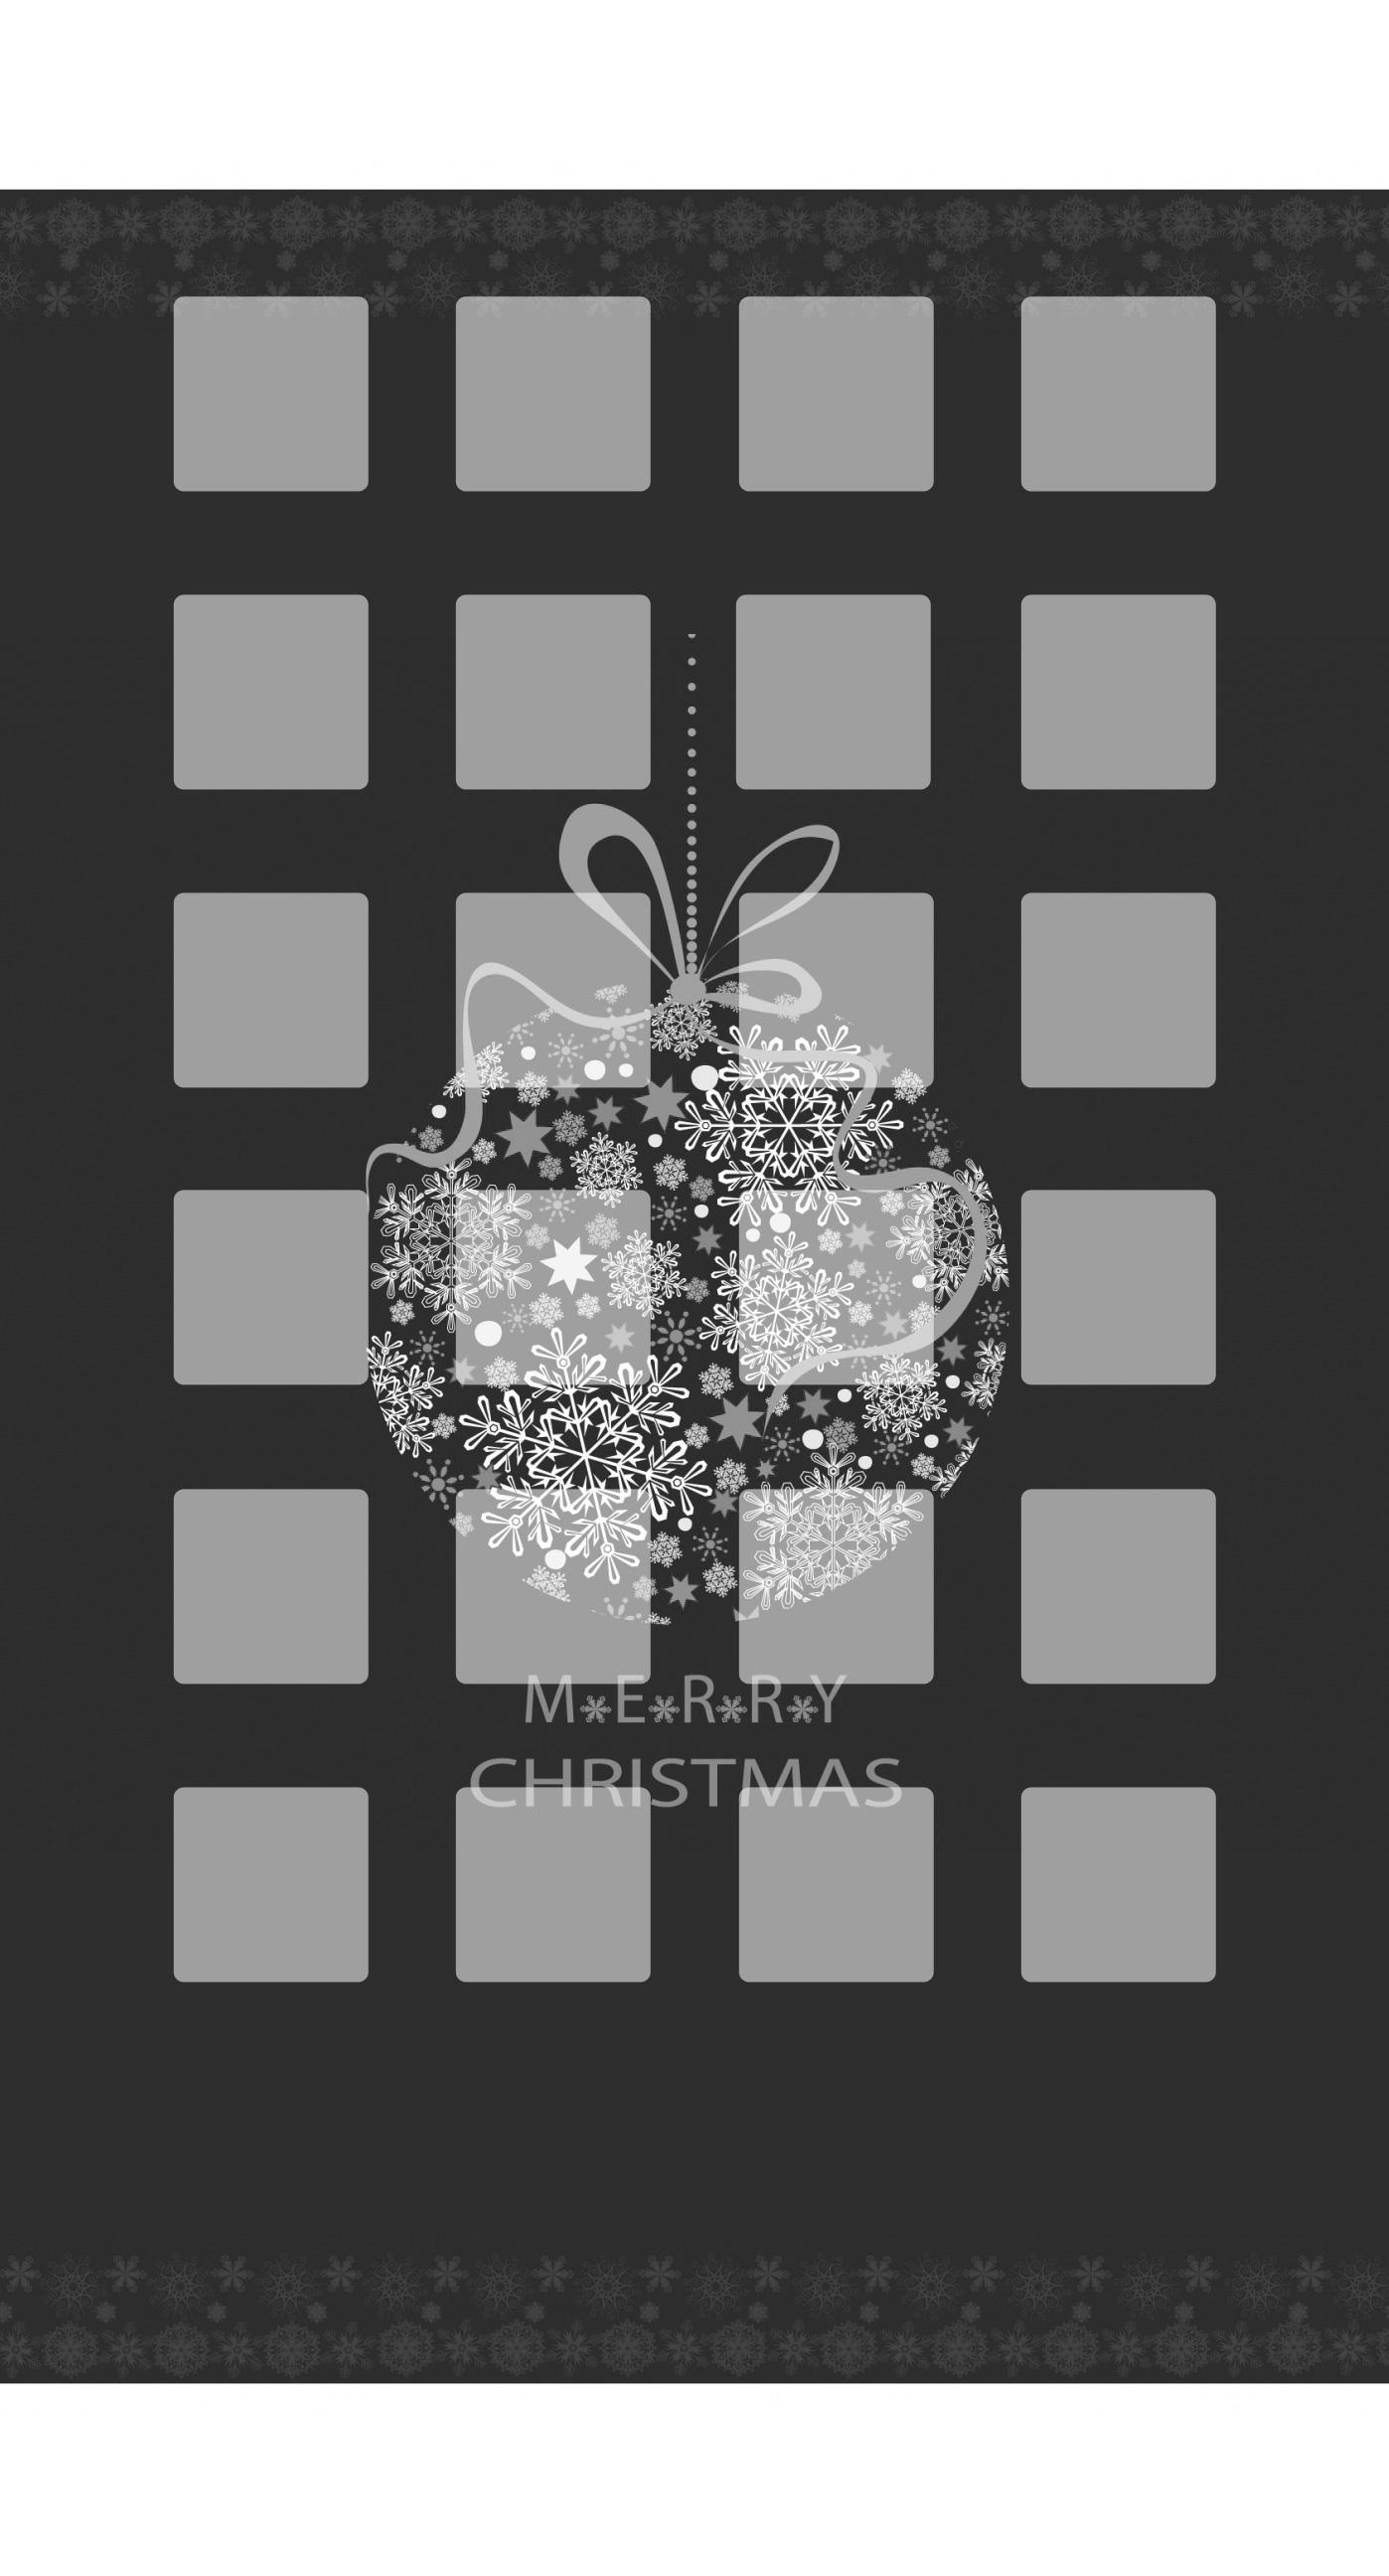 Shelf Black Christmas Women Wallpaper Sc Iphone8plus